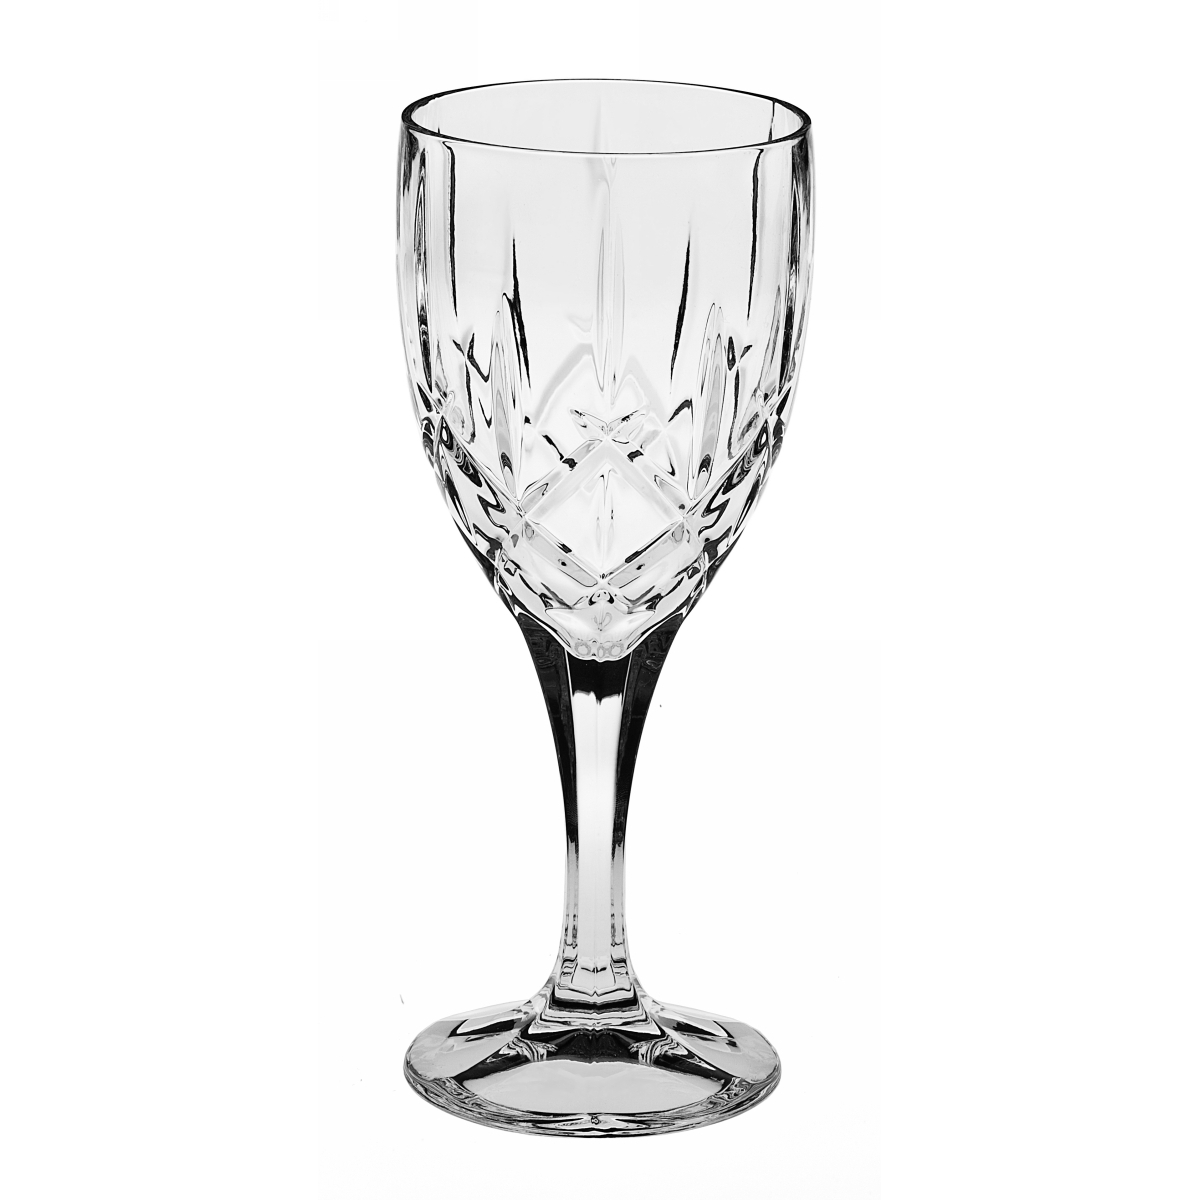 SHEFFIELD Set 6 pahare cristal Bohemia vin 330 ml